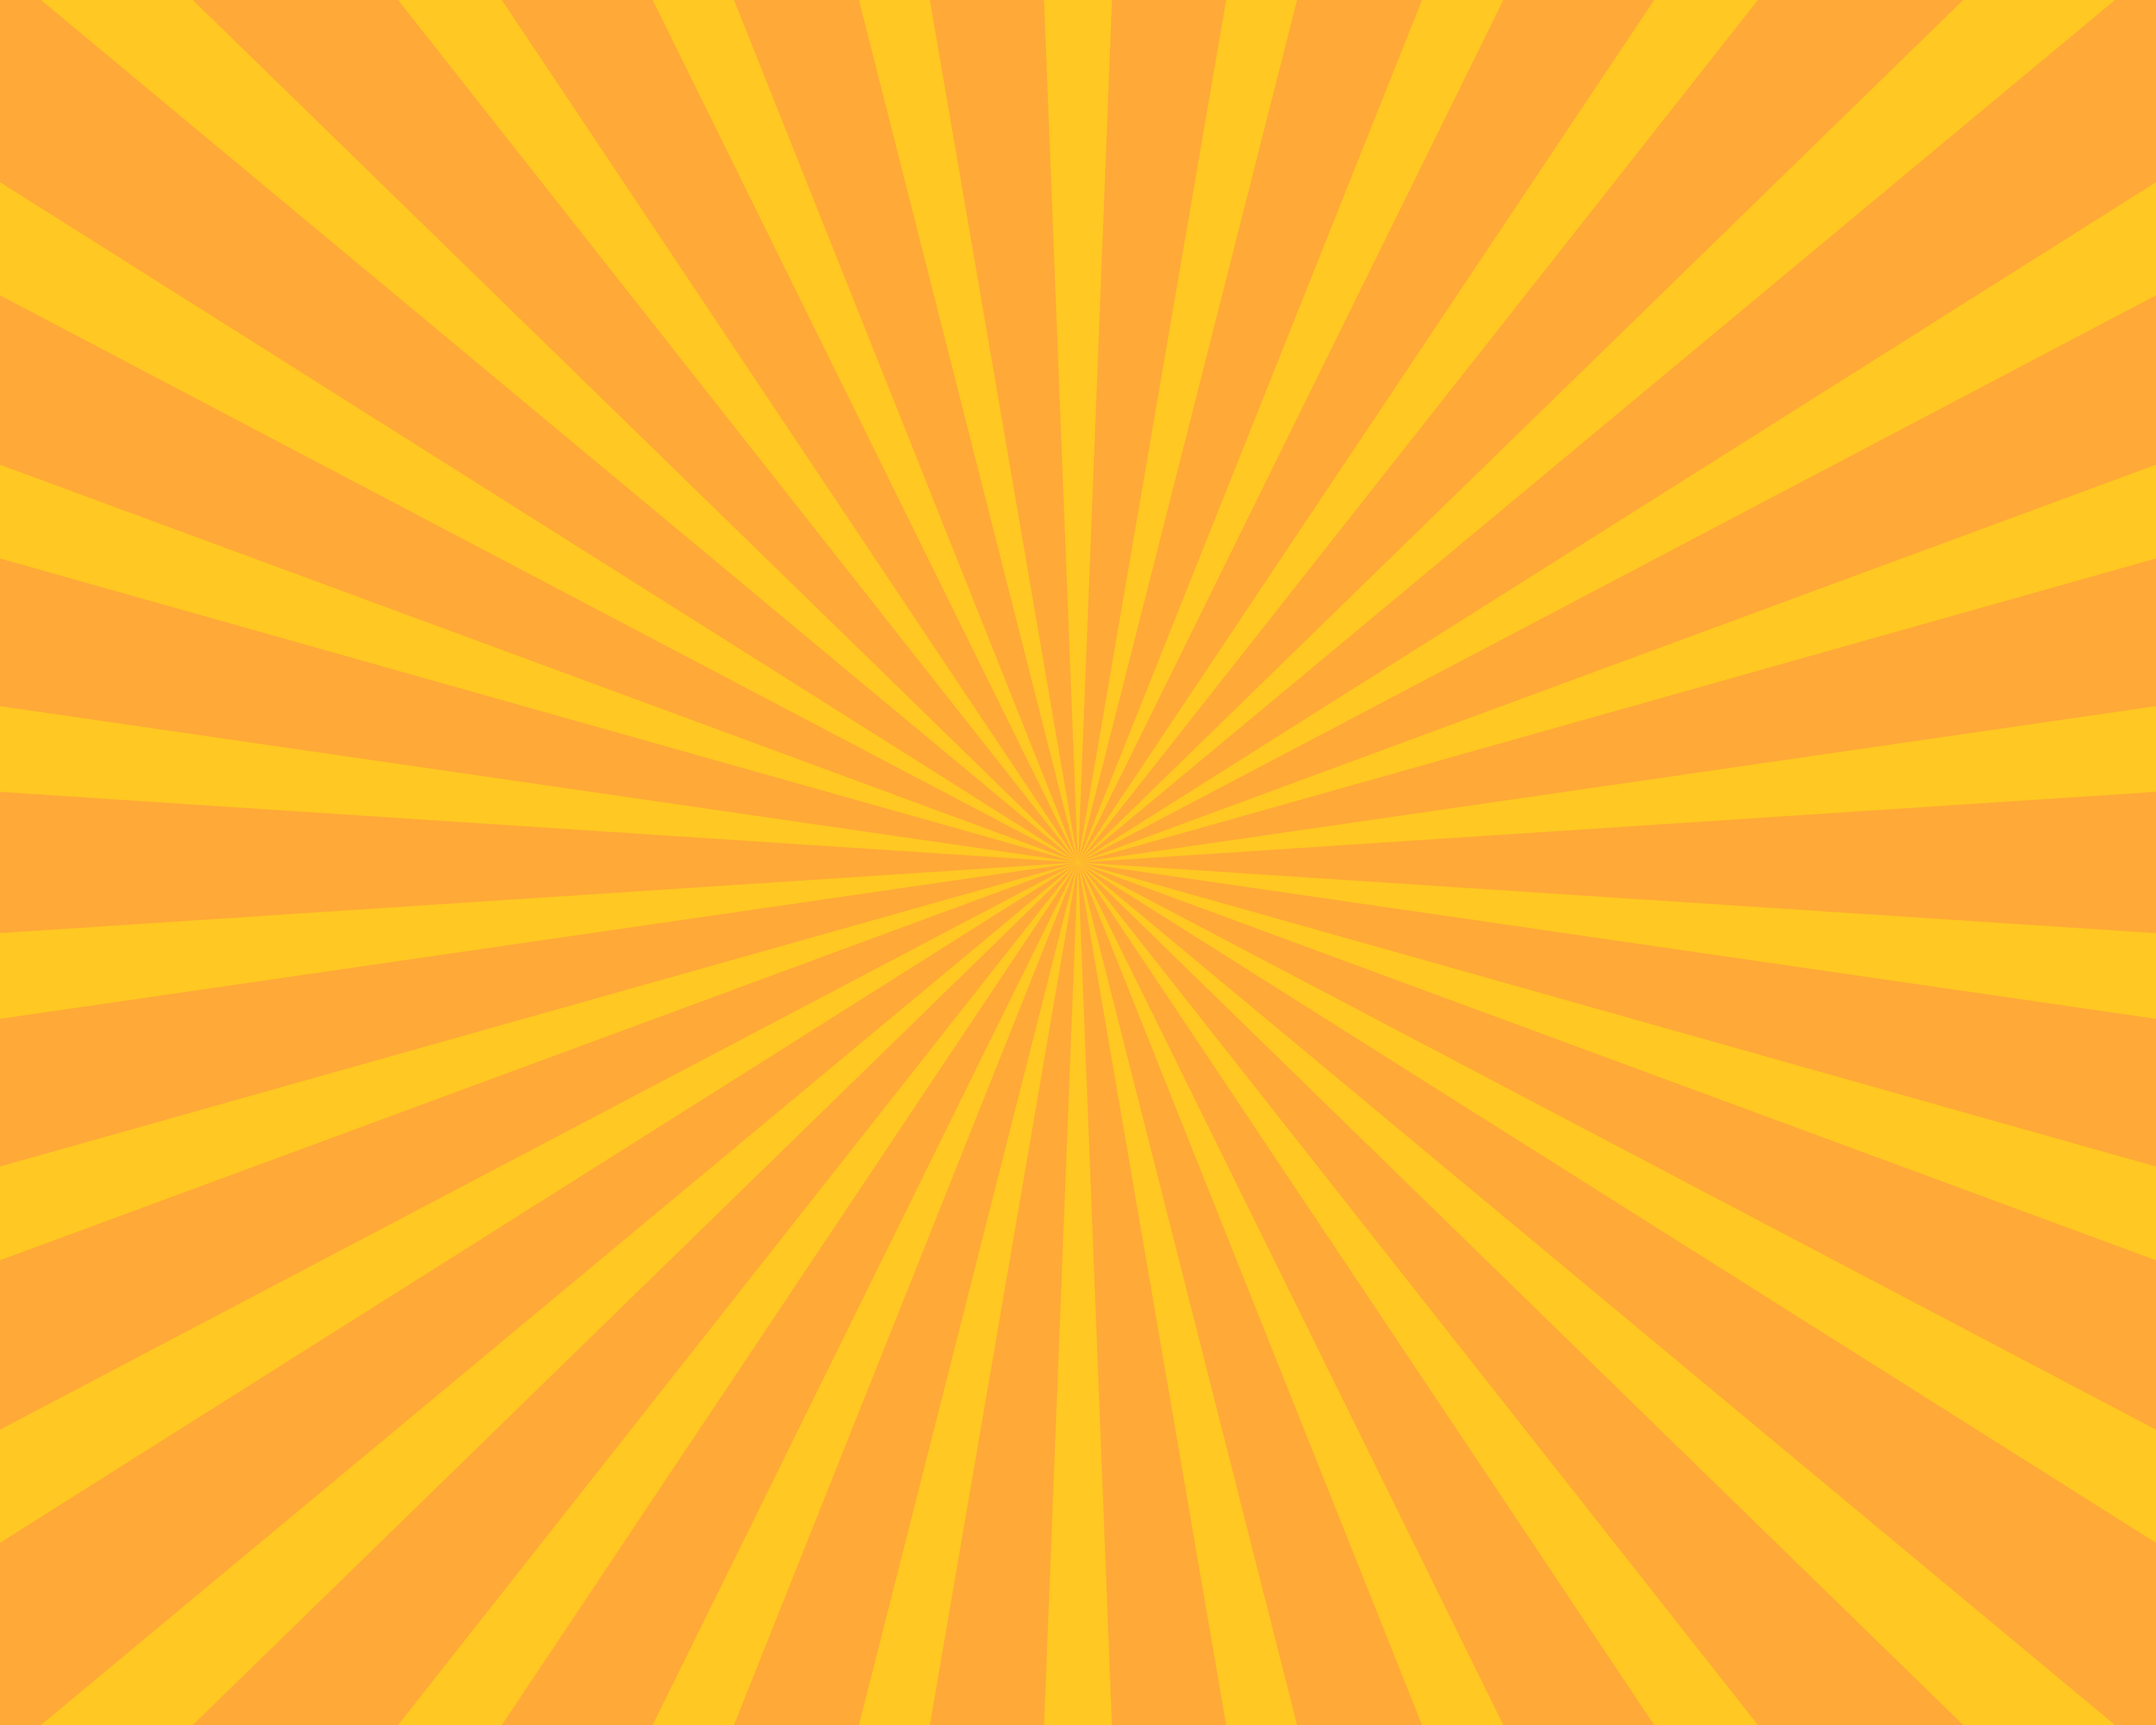 180110 01 Orange yellow sun burst vector background